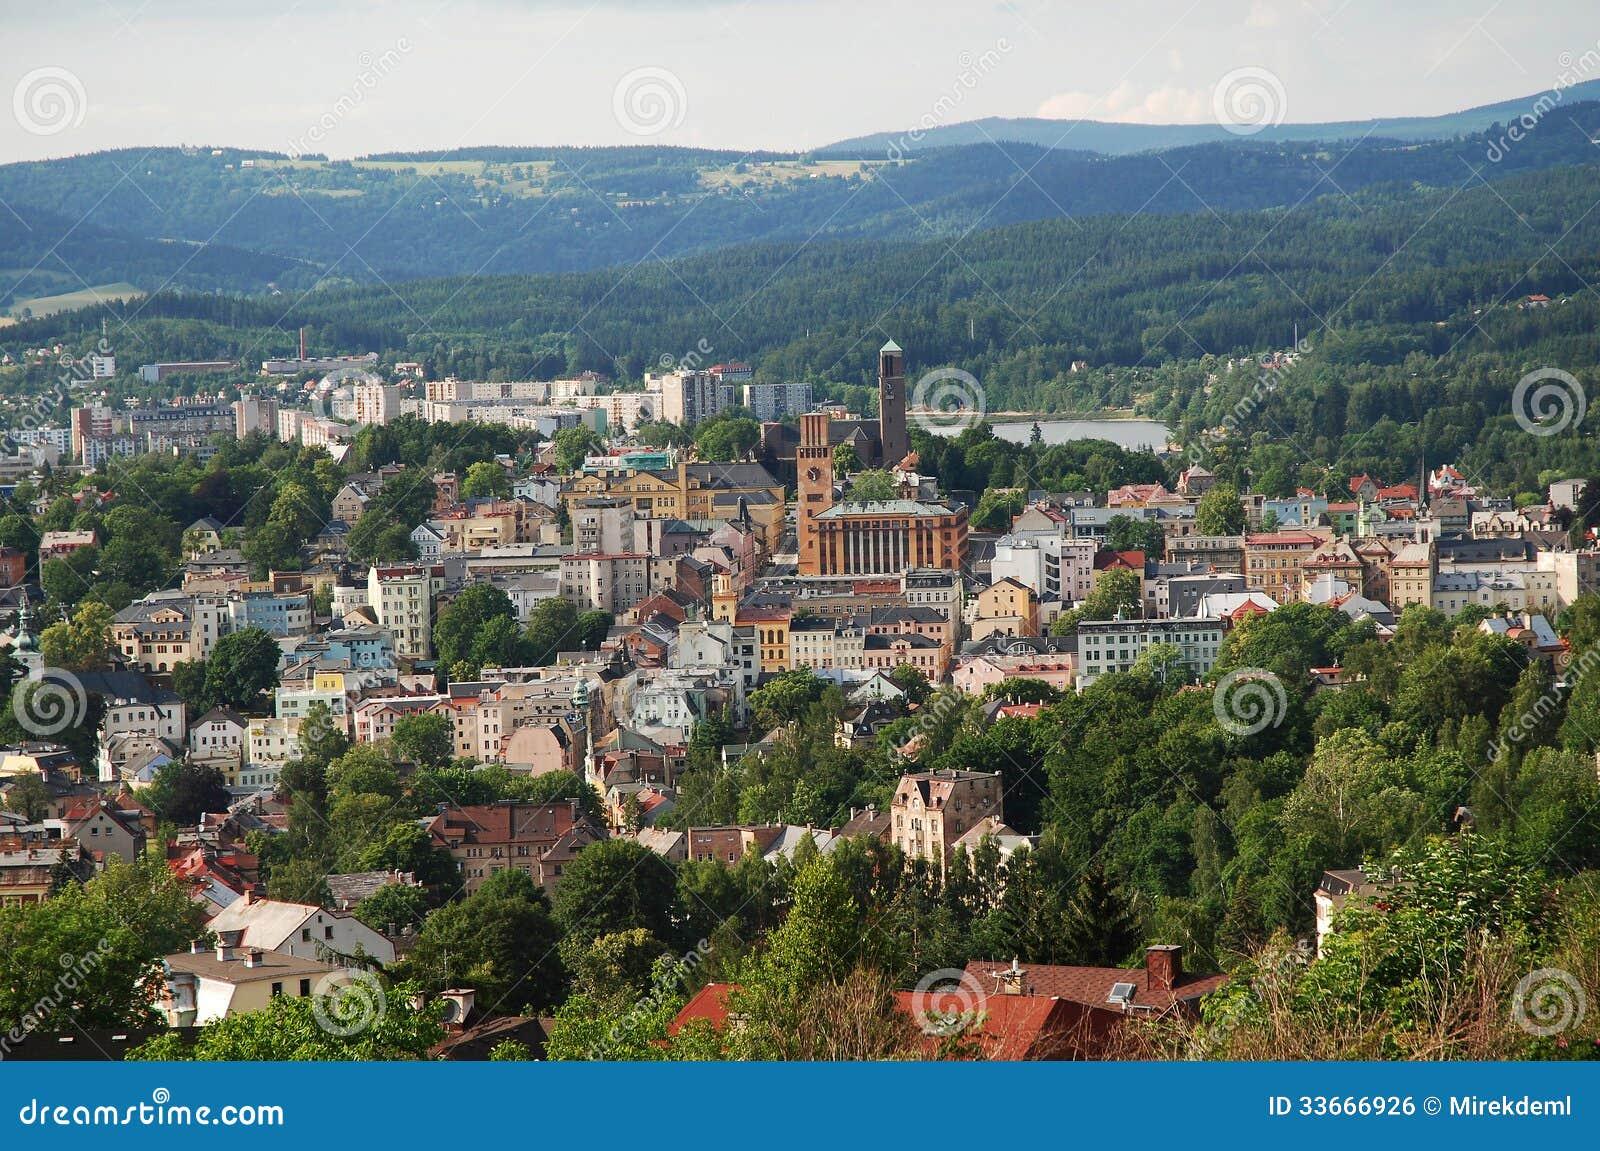 Jablonec nad Nisou, Czech republic